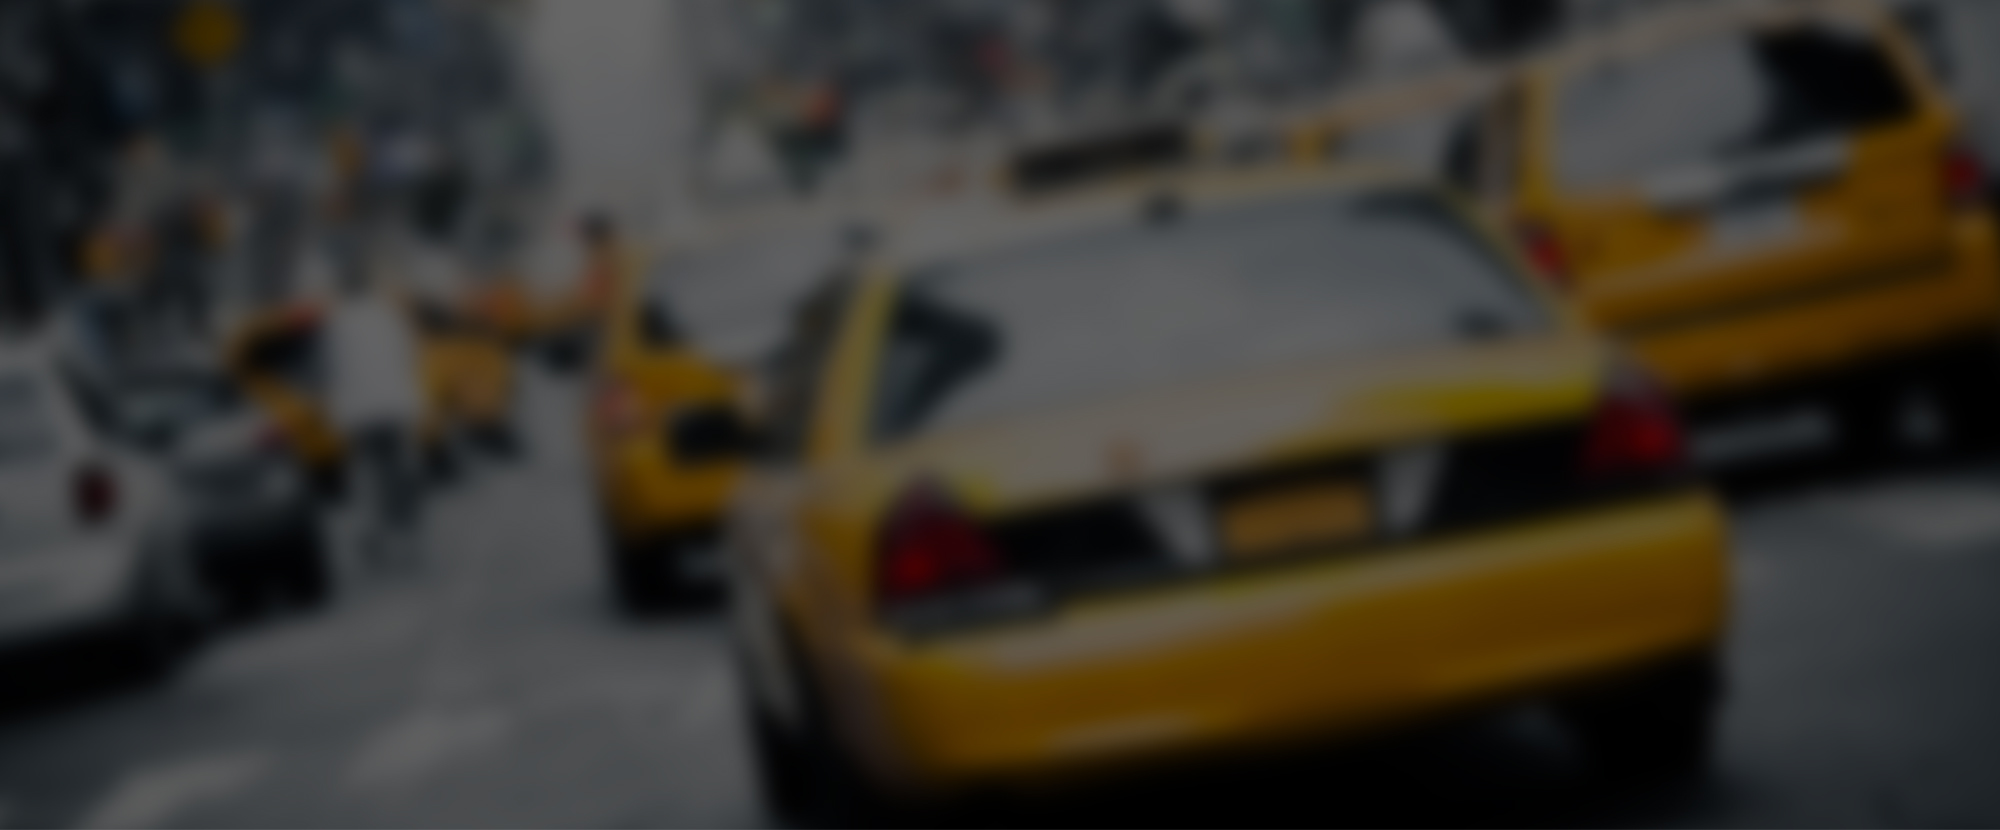 main background   Kigali 24 7 Car hire Taxi service 2000x830